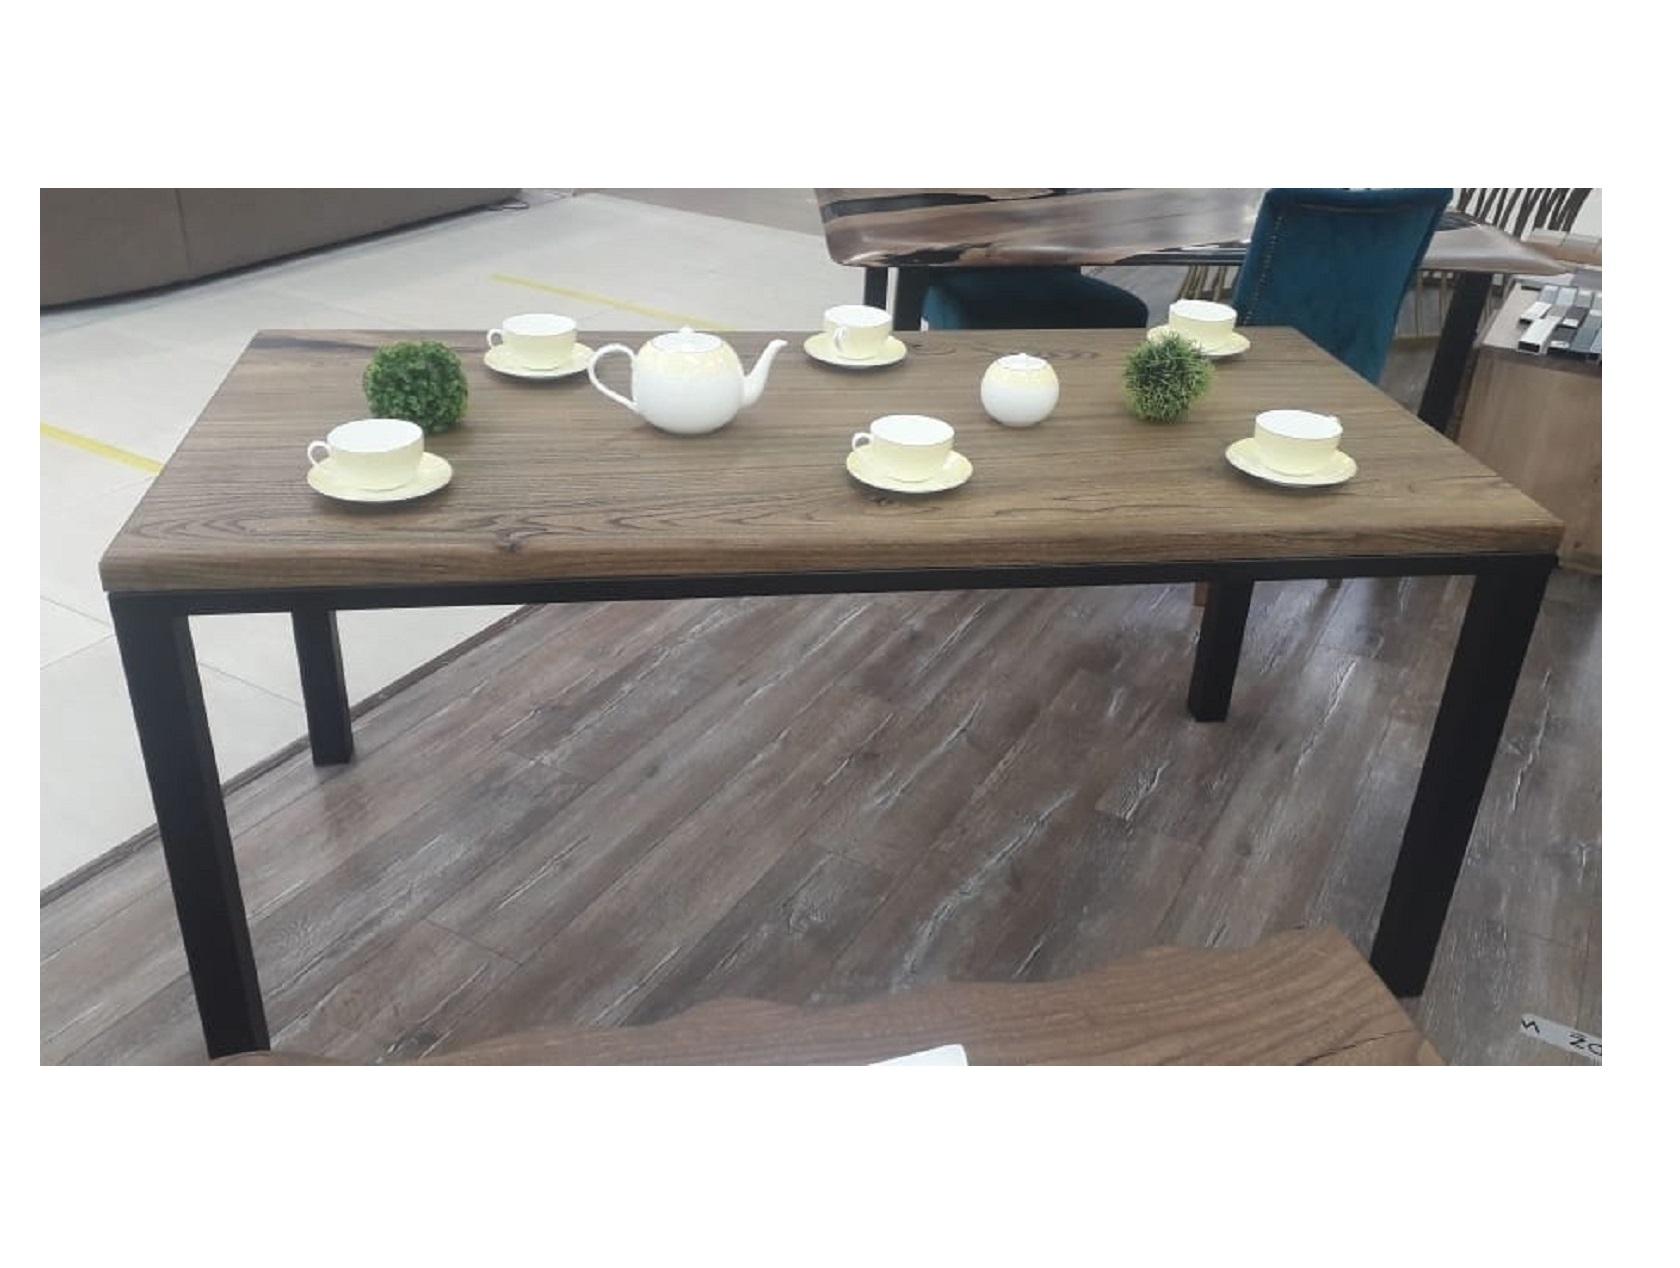 Обеденный стол (woodzpro) коричневый 80x75x170 см.